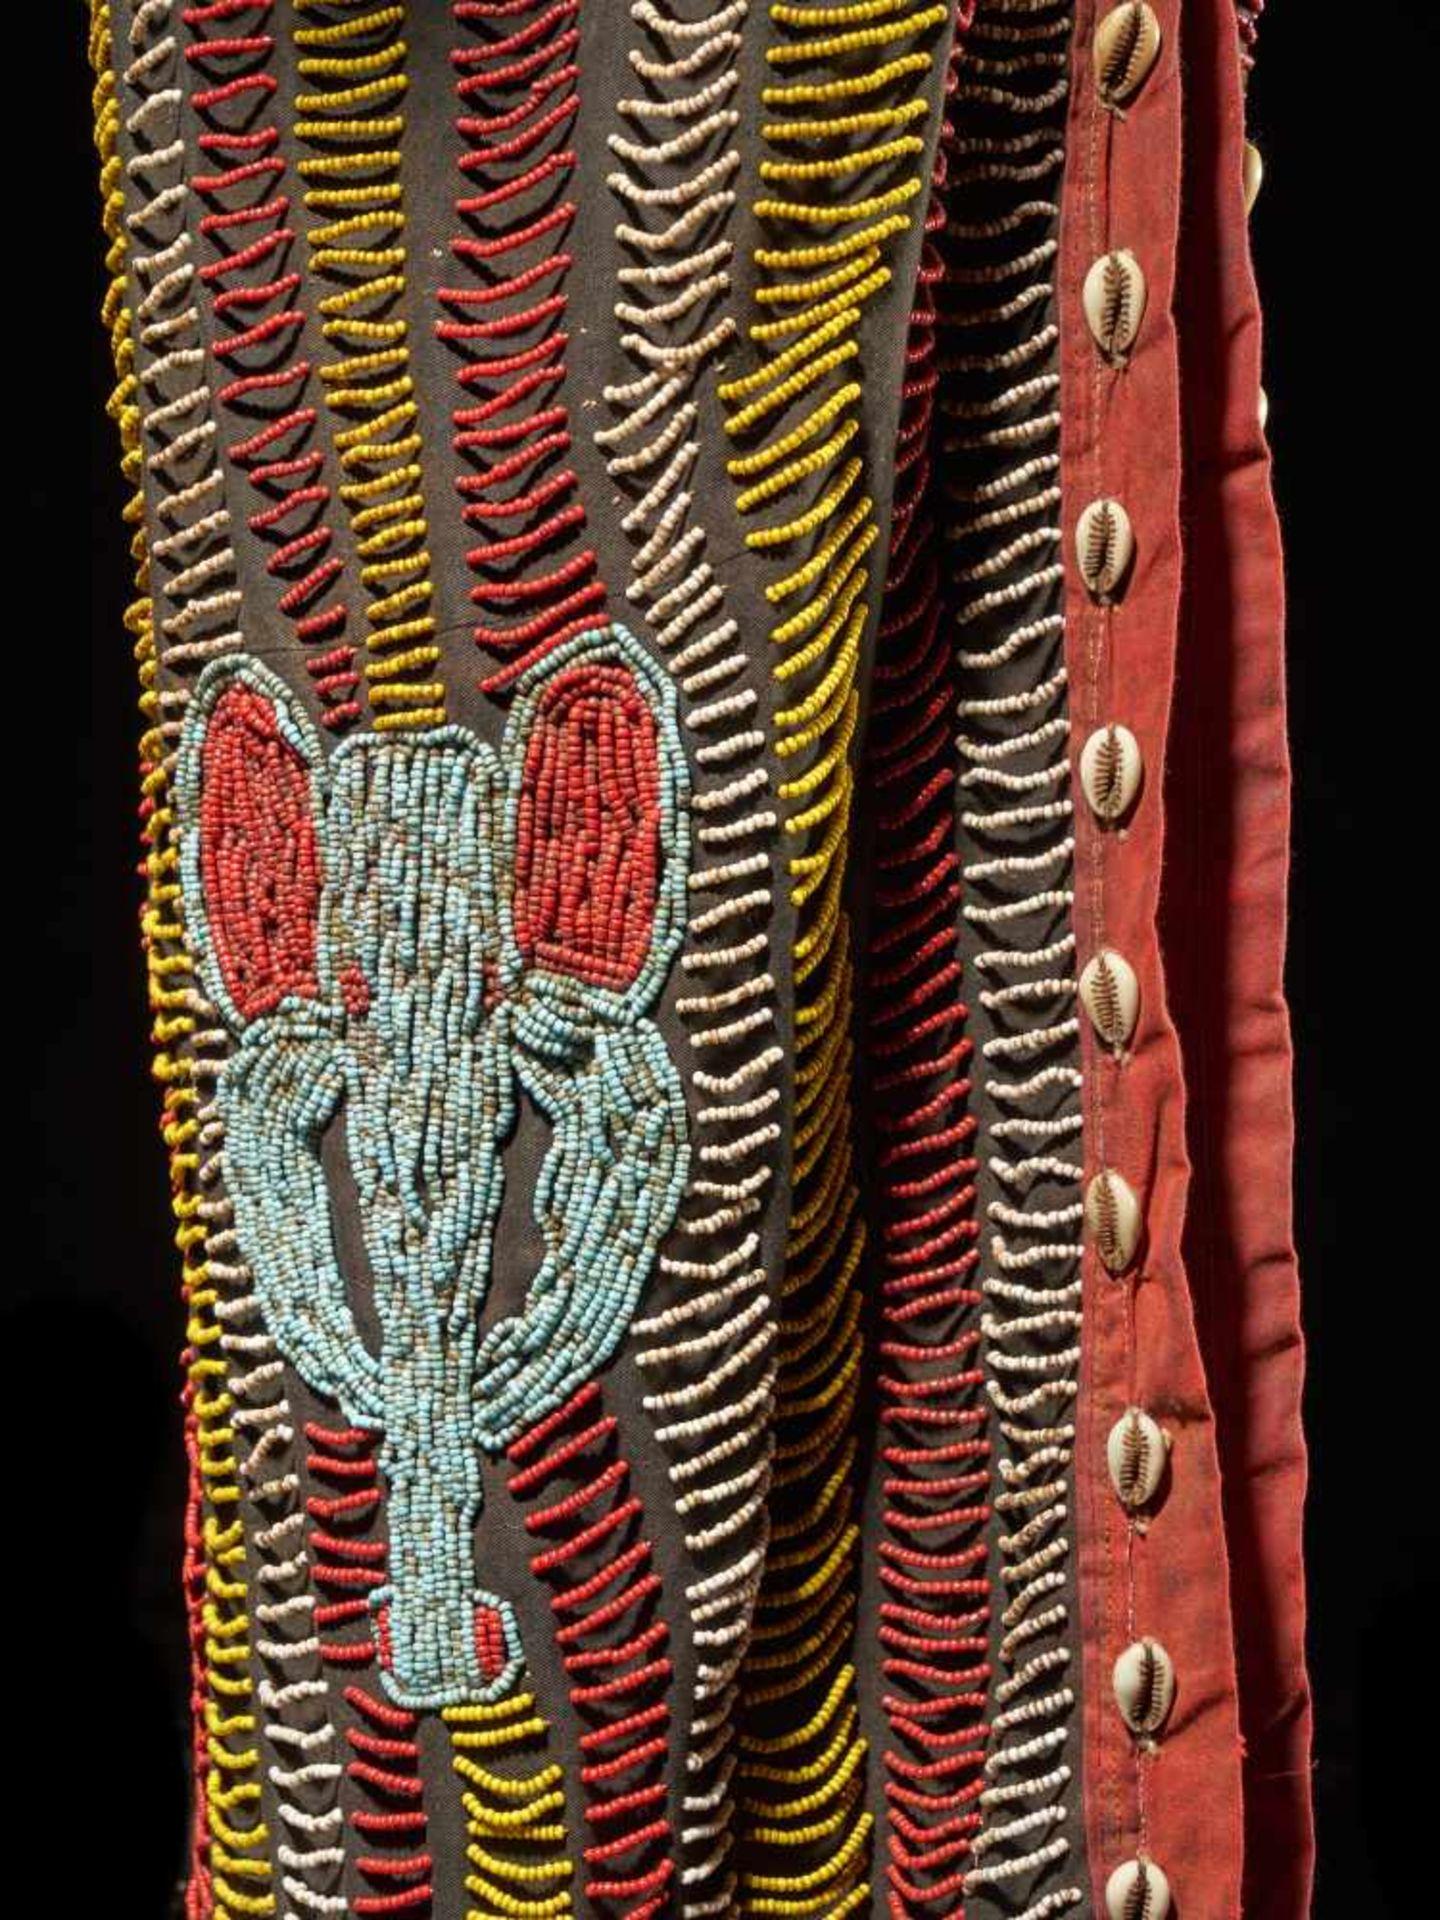 Beaded Triple Head Sculpture Covered With Kauris - Tribal ArtThis beautiful triple-faced head - Bild 9 aus 10